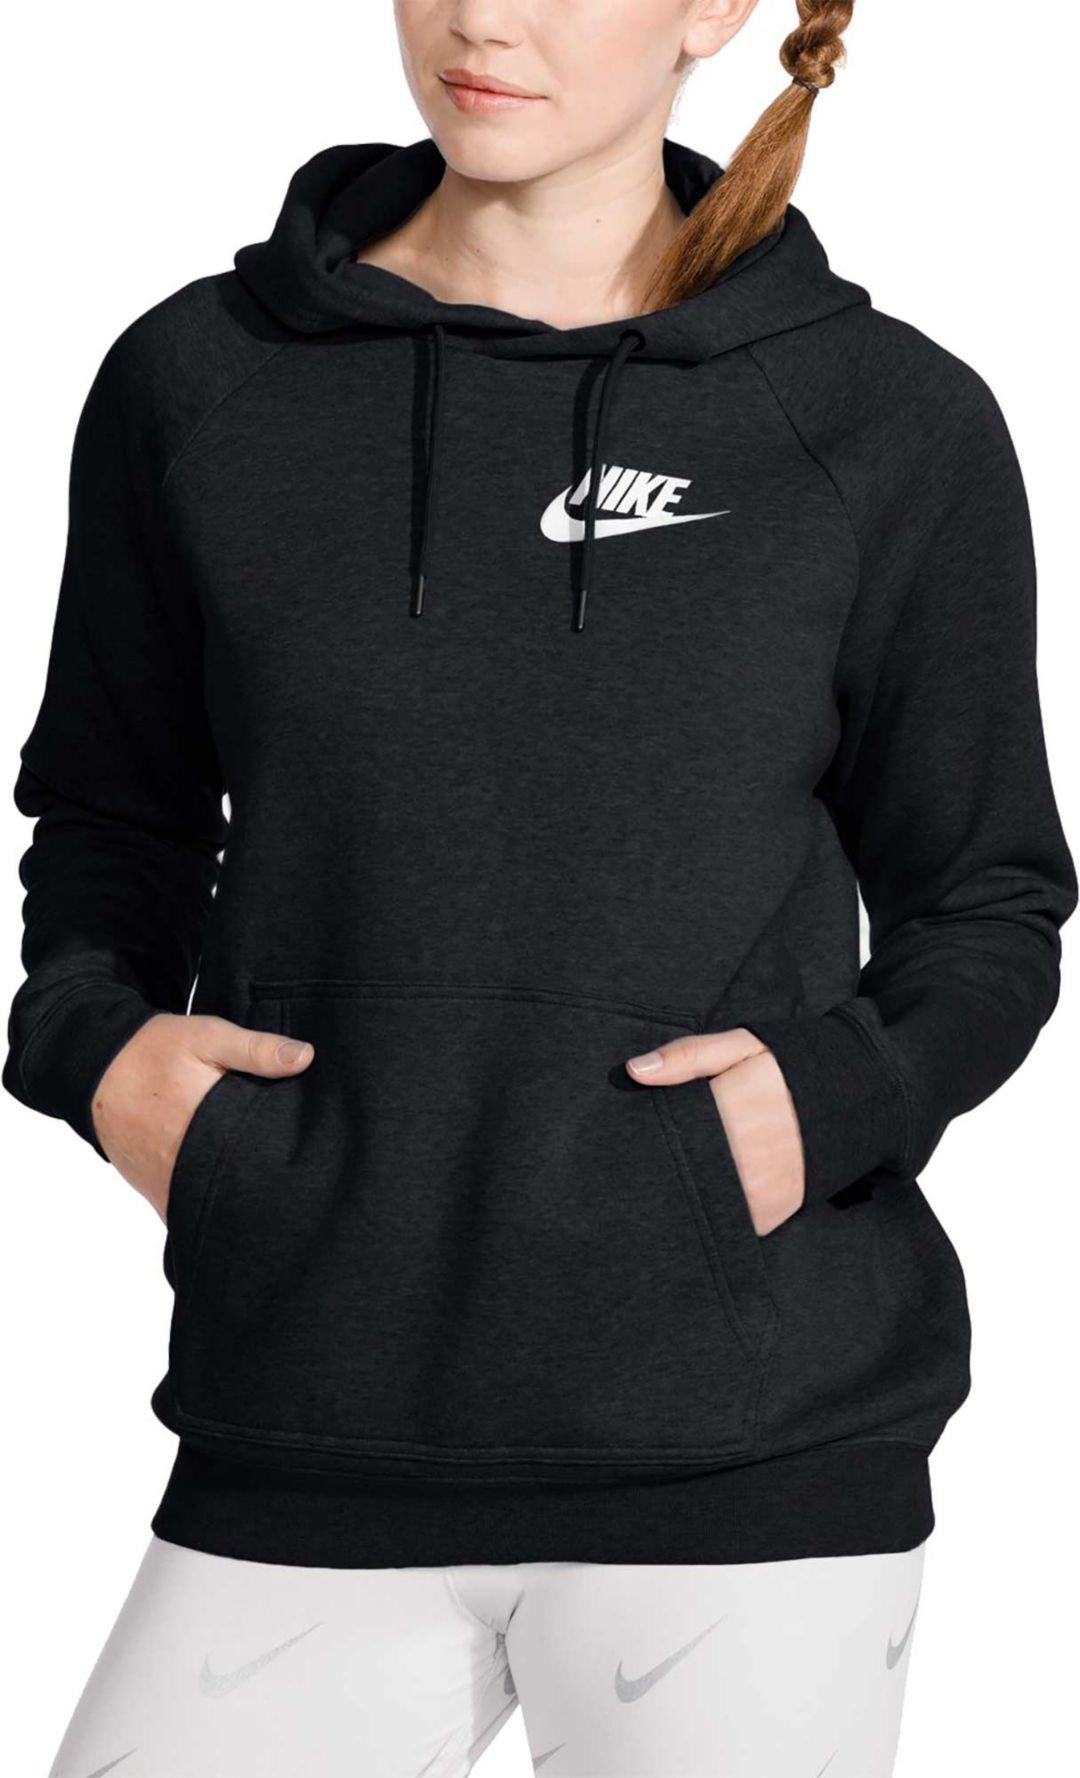 90a8c104b5e2 Nike Women's Sportswear Rally Hoodie. noImageFound. Previous